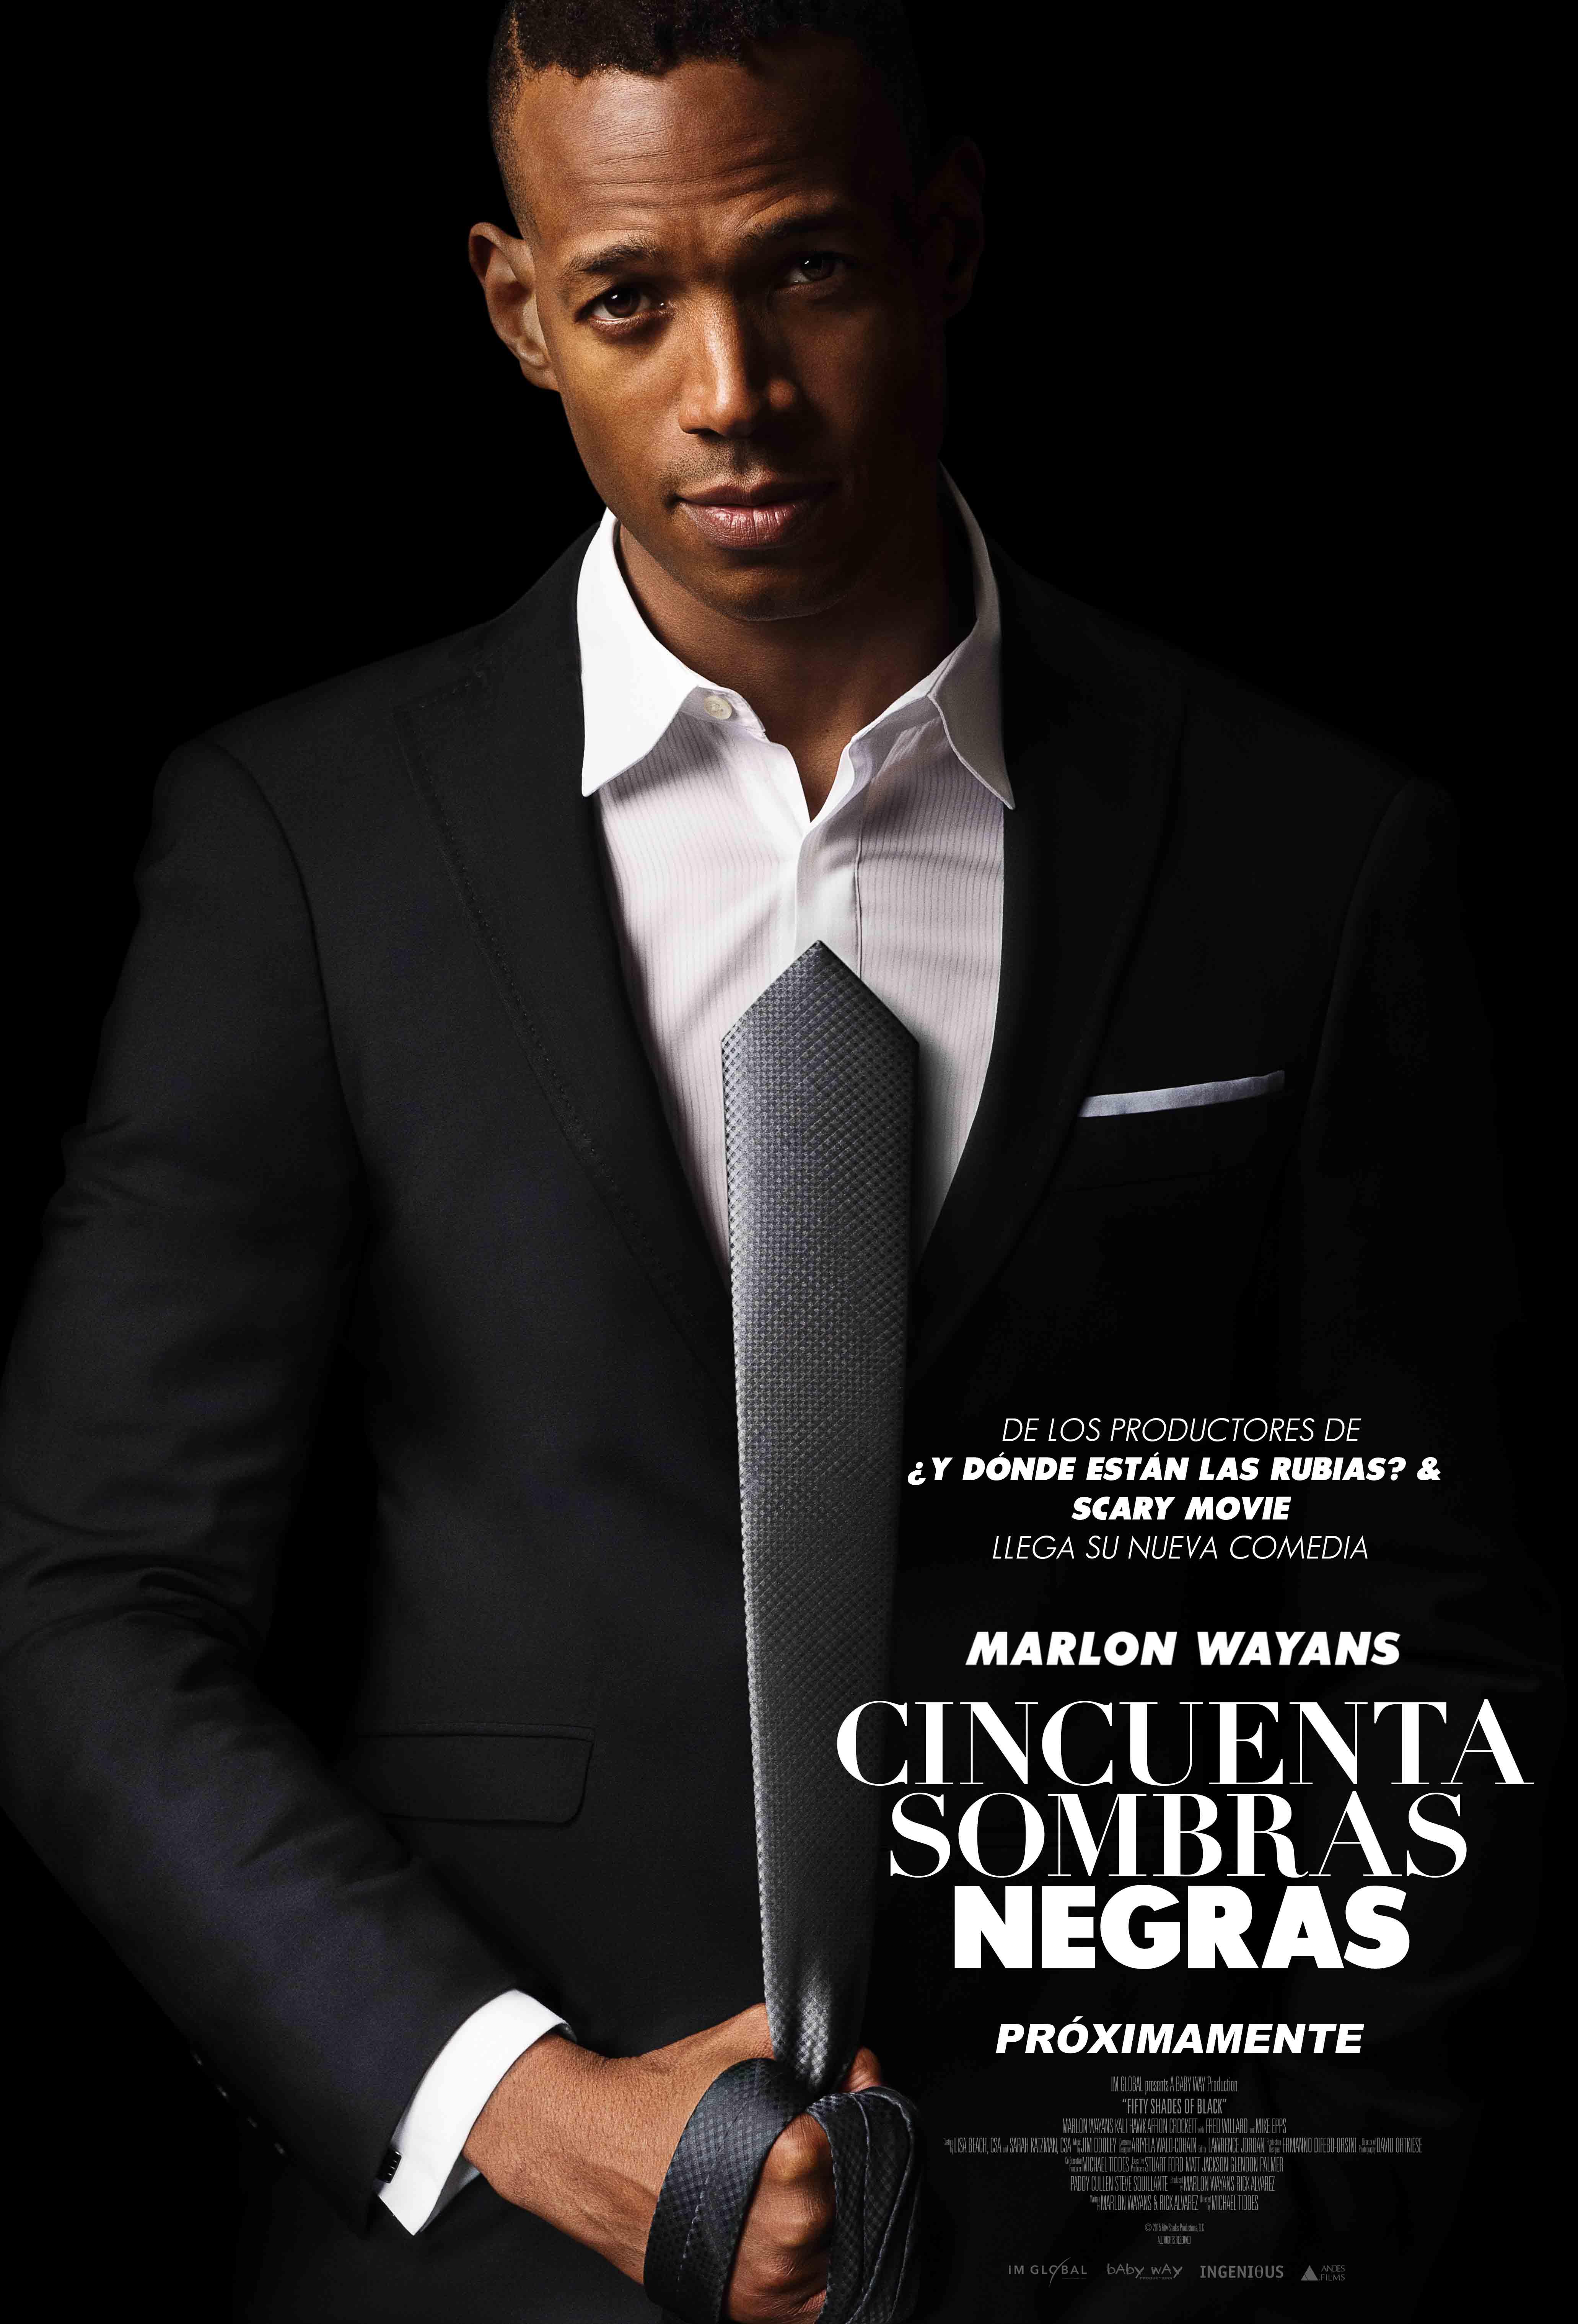 http://www.andesfilms.com.pe/50-sombras-negras-1102/